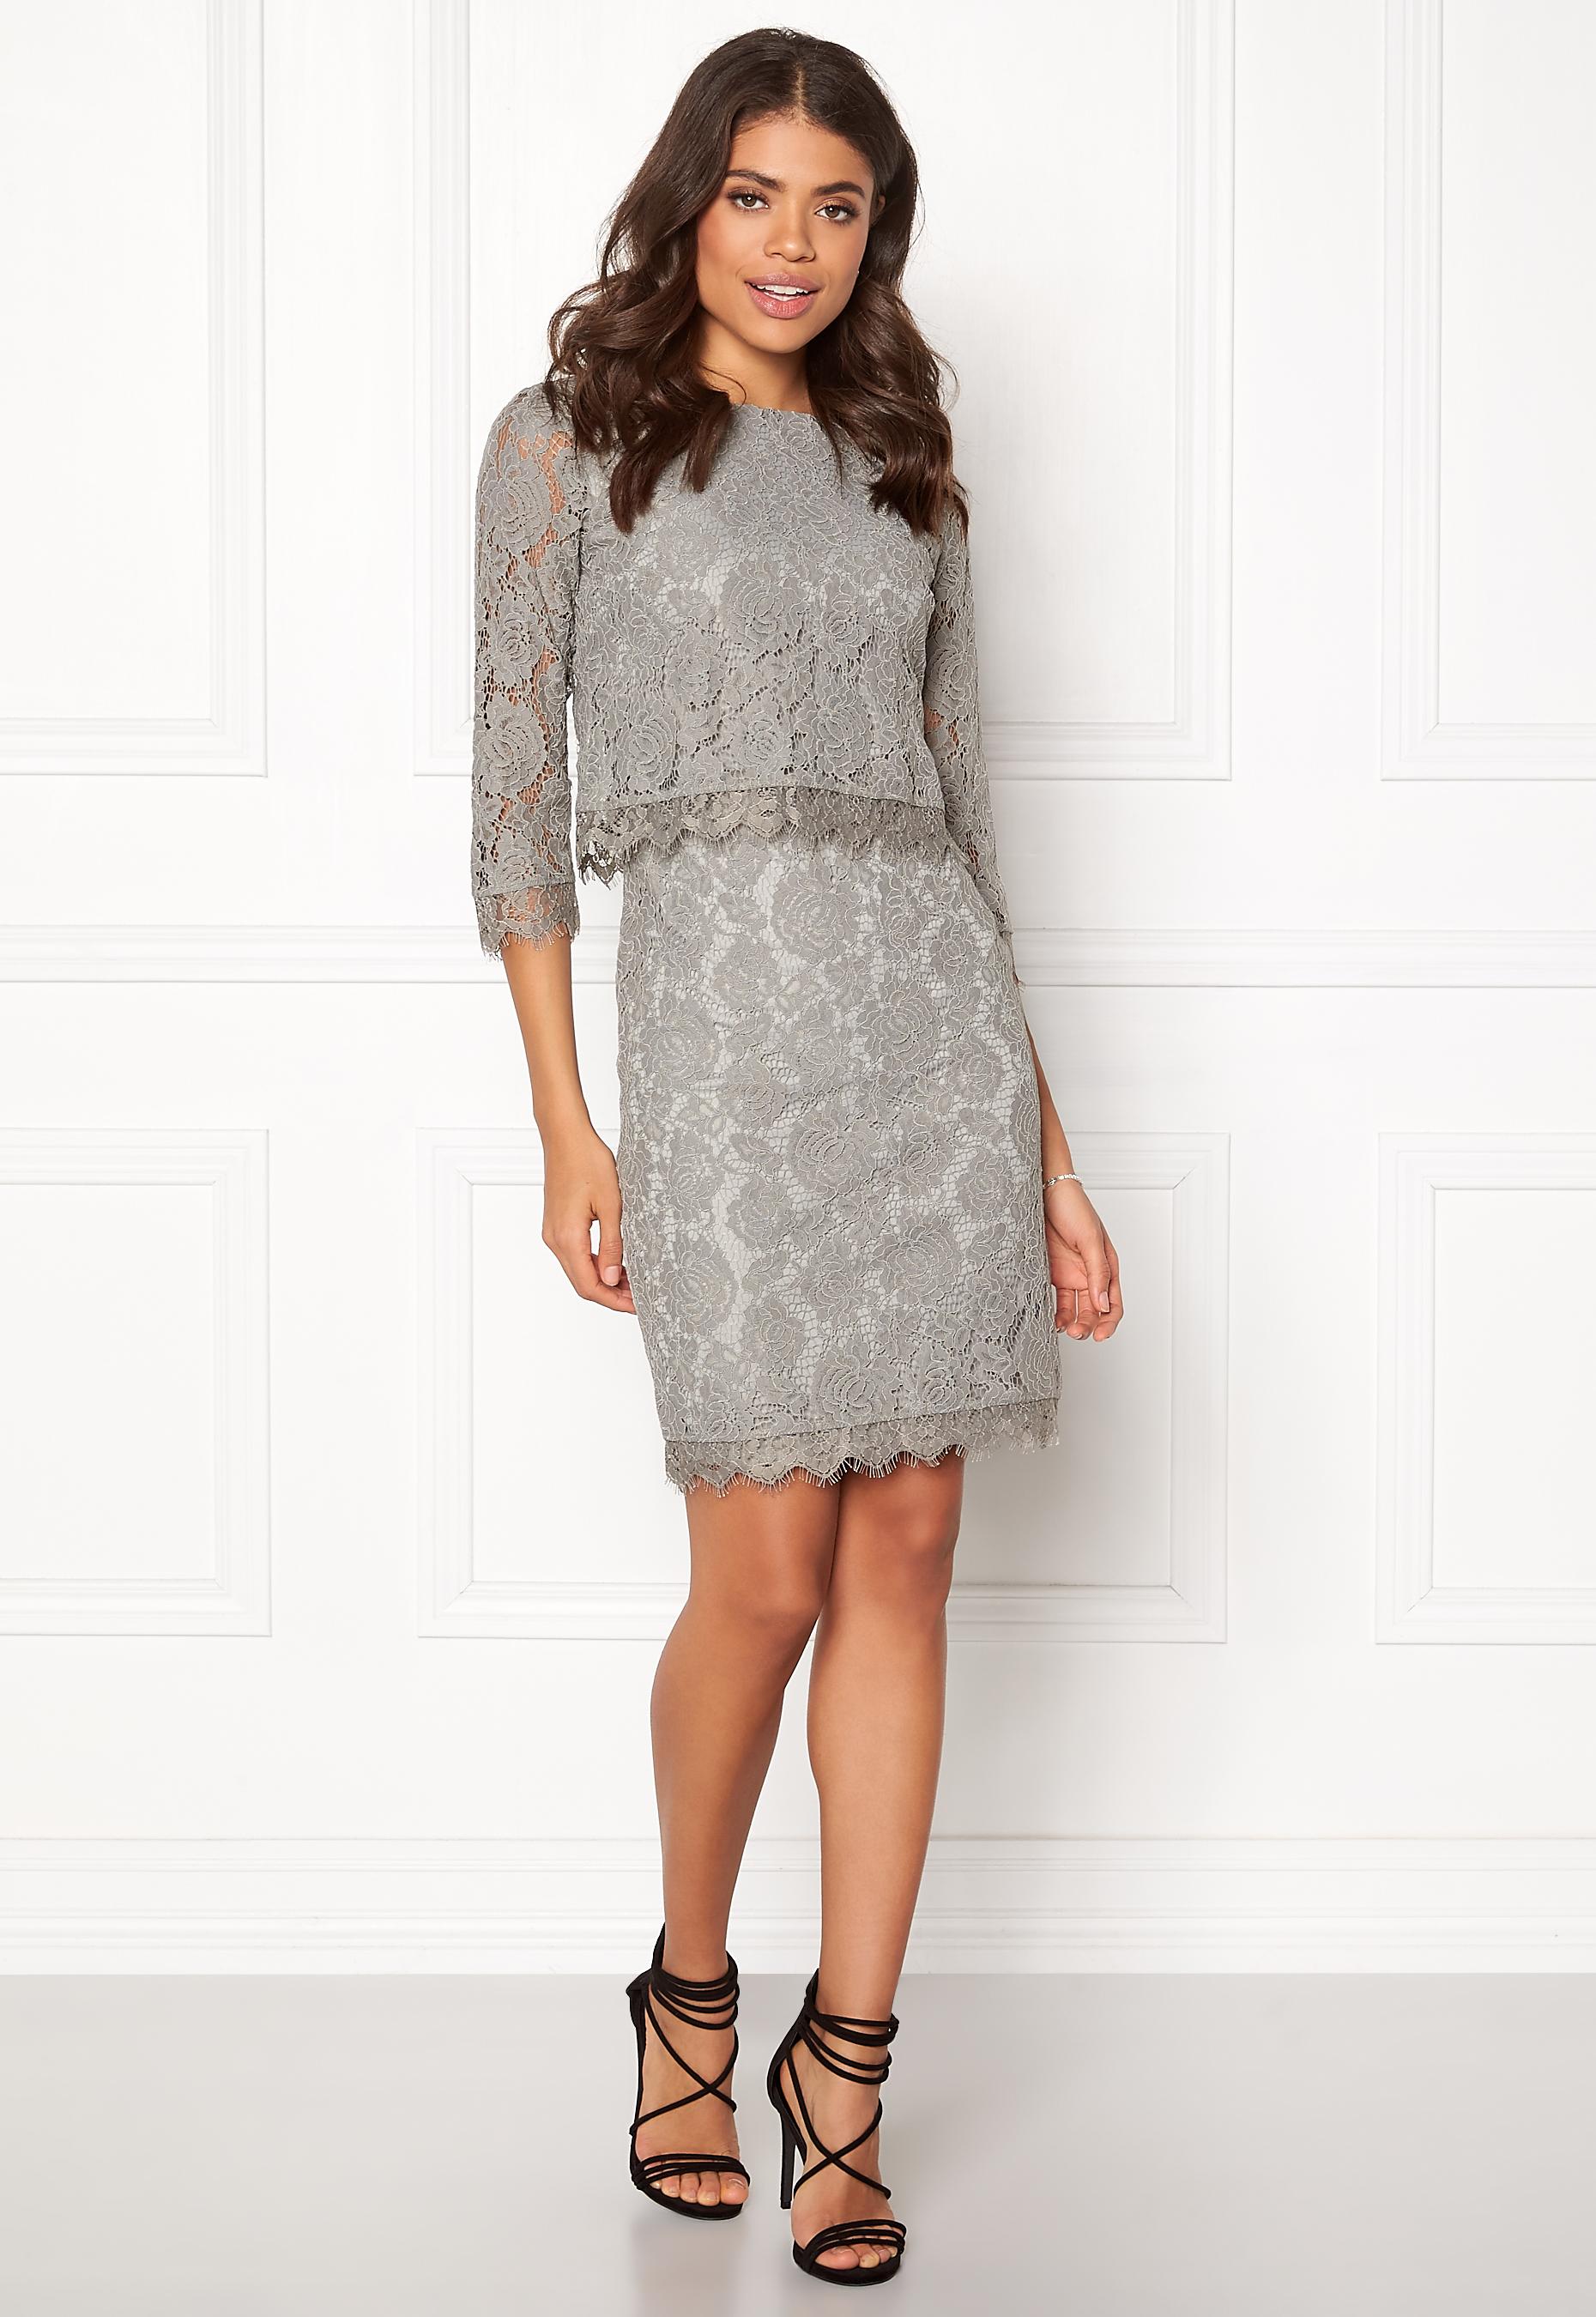 954b1eaf DRY LAKE Malou Dress Light Grey - Bubbleroom